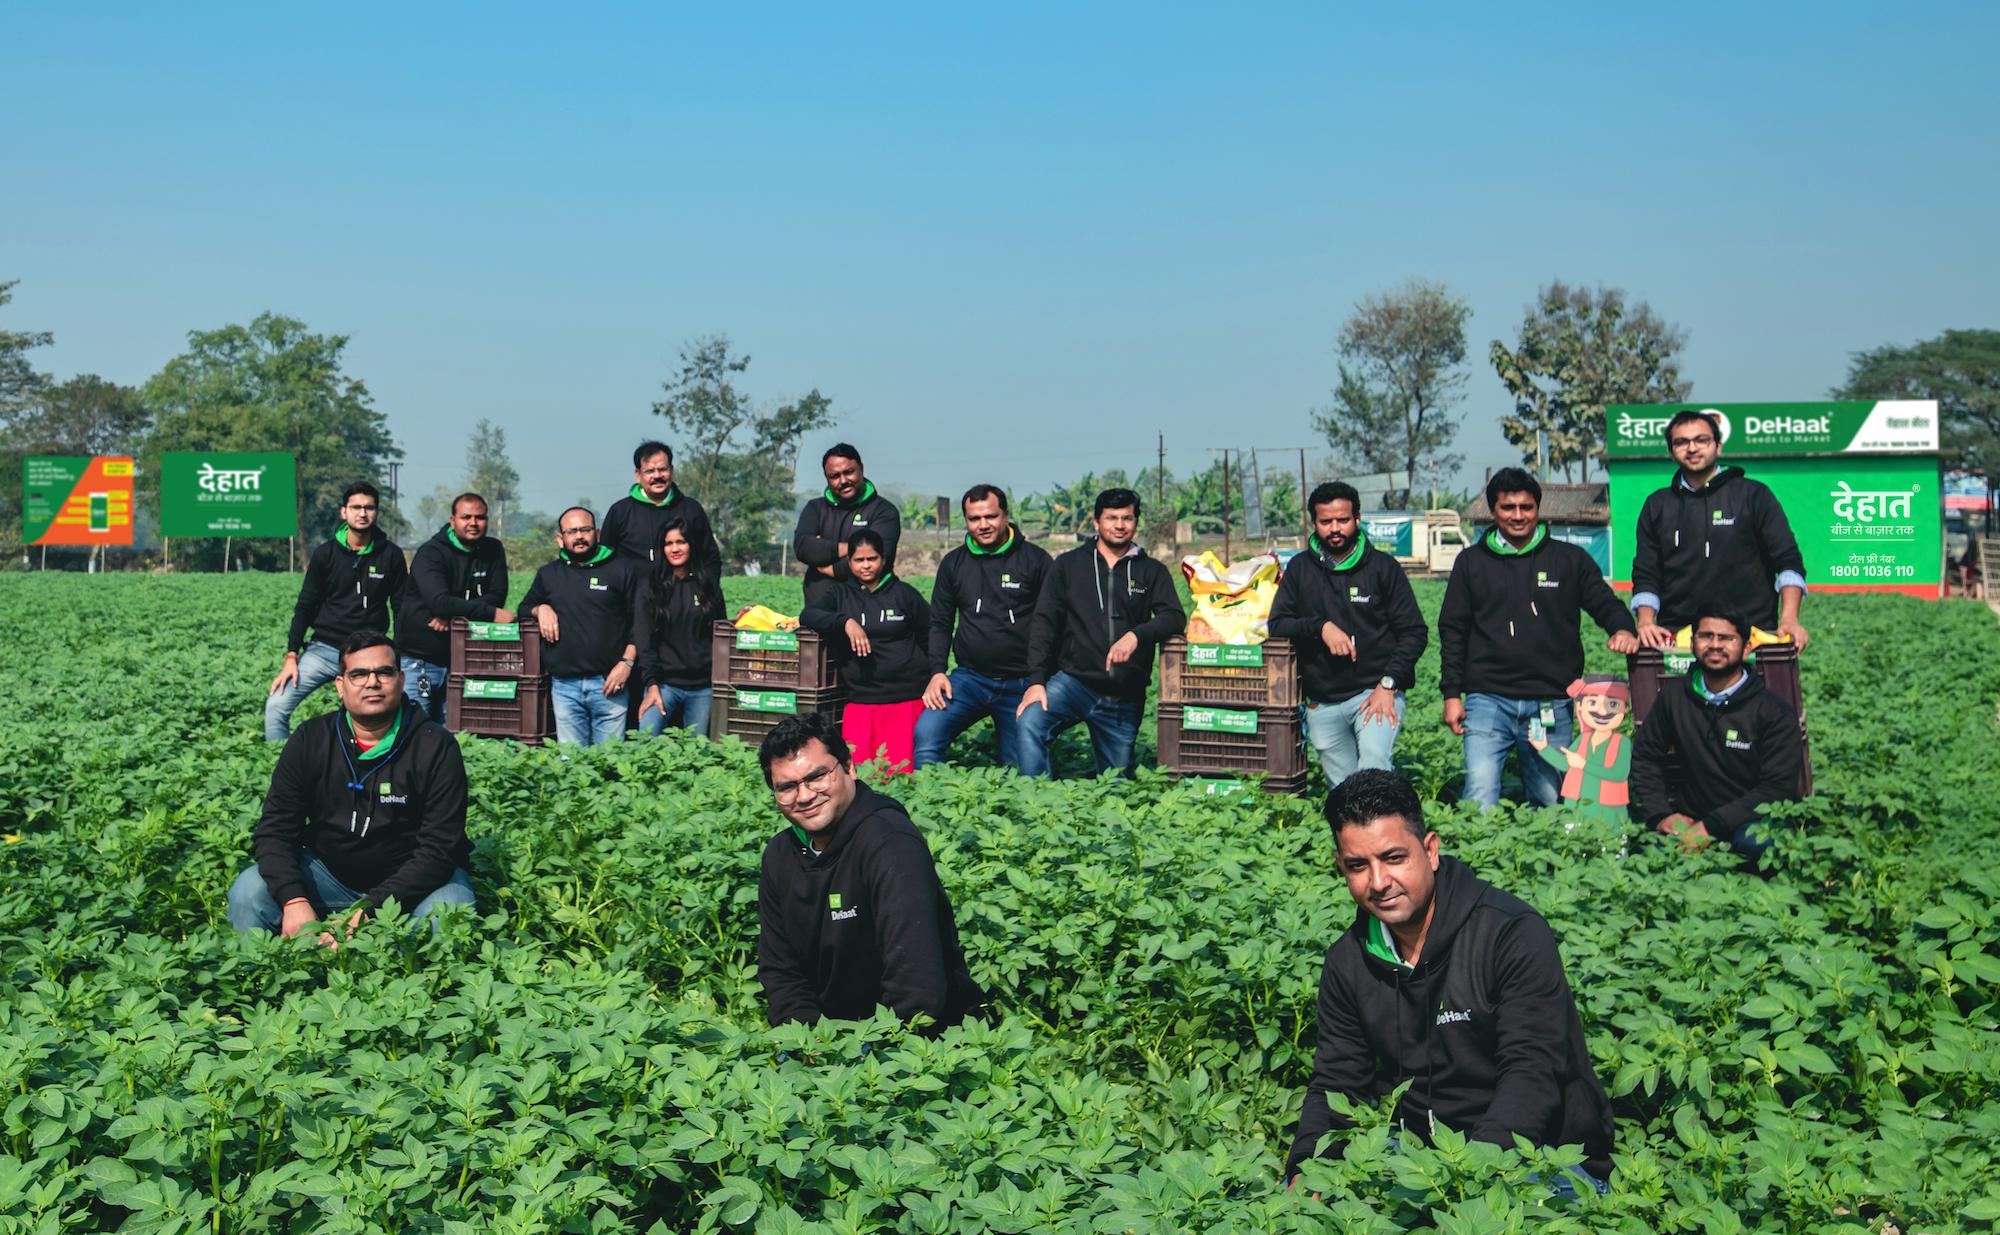 techcrunch.com - Manish Singh - Prosus Ventures leads $30 million investment in Indian agritech startup DeHaat